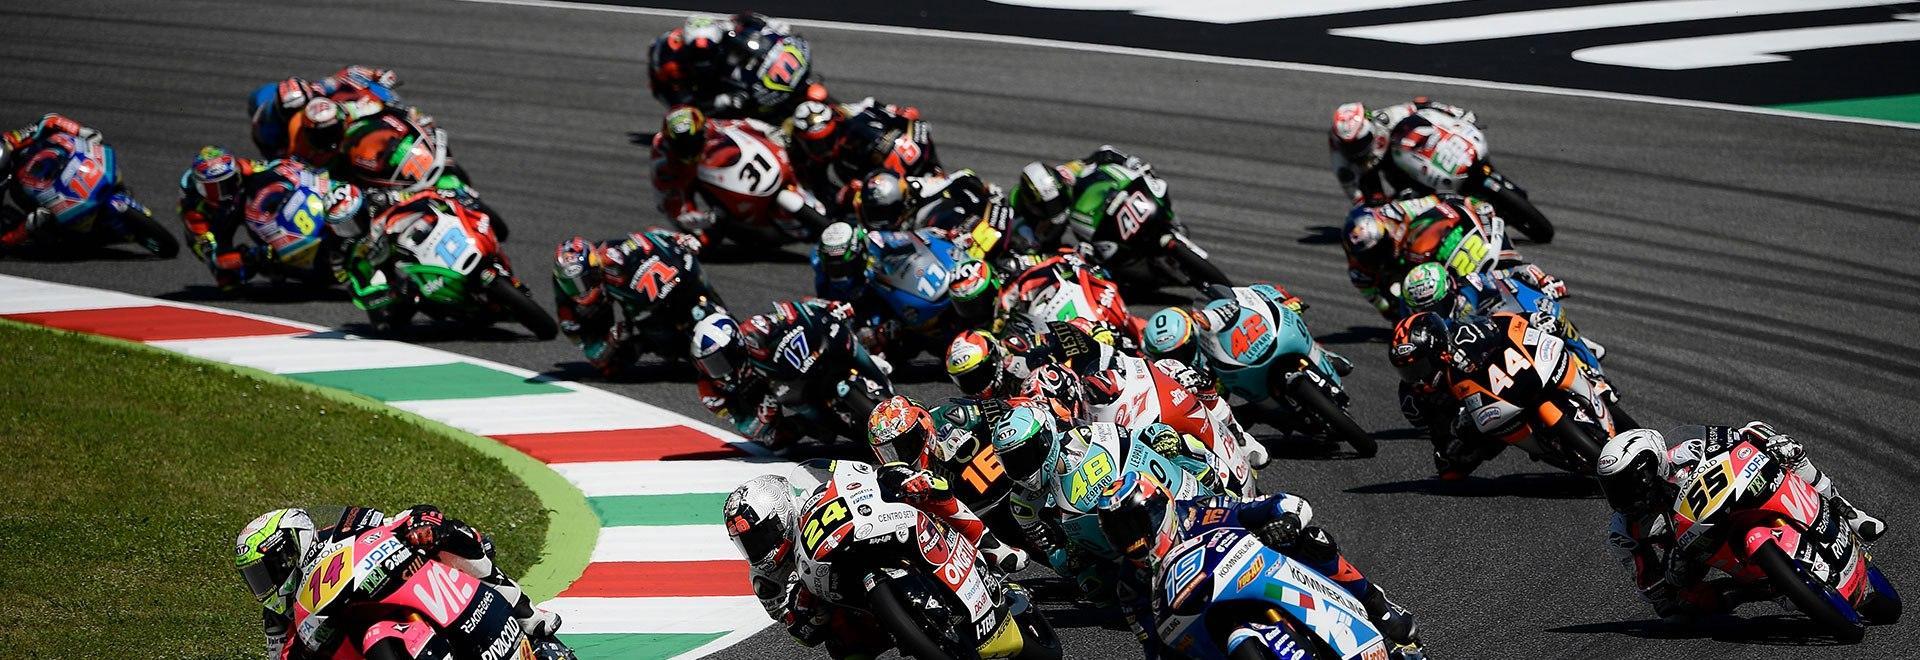 PreMoto3 Imola. Race 2